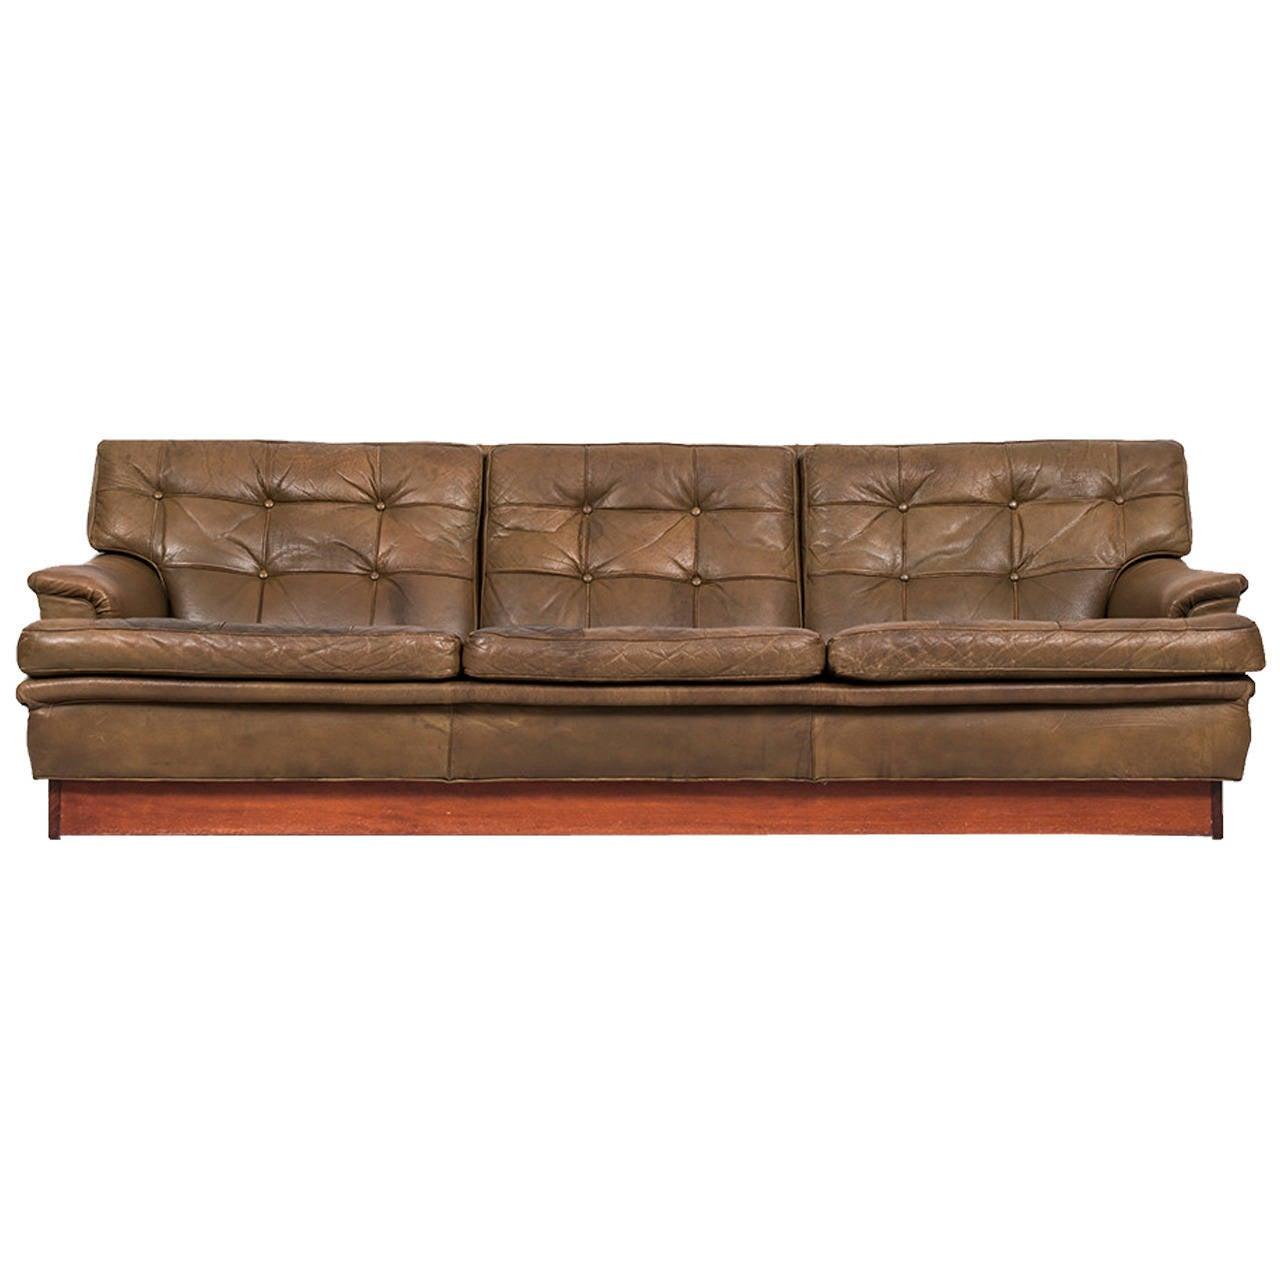 Buffalo Leather Sofa Greg Stone Dakota Bison Furniture Rapid City Sd Thesofa